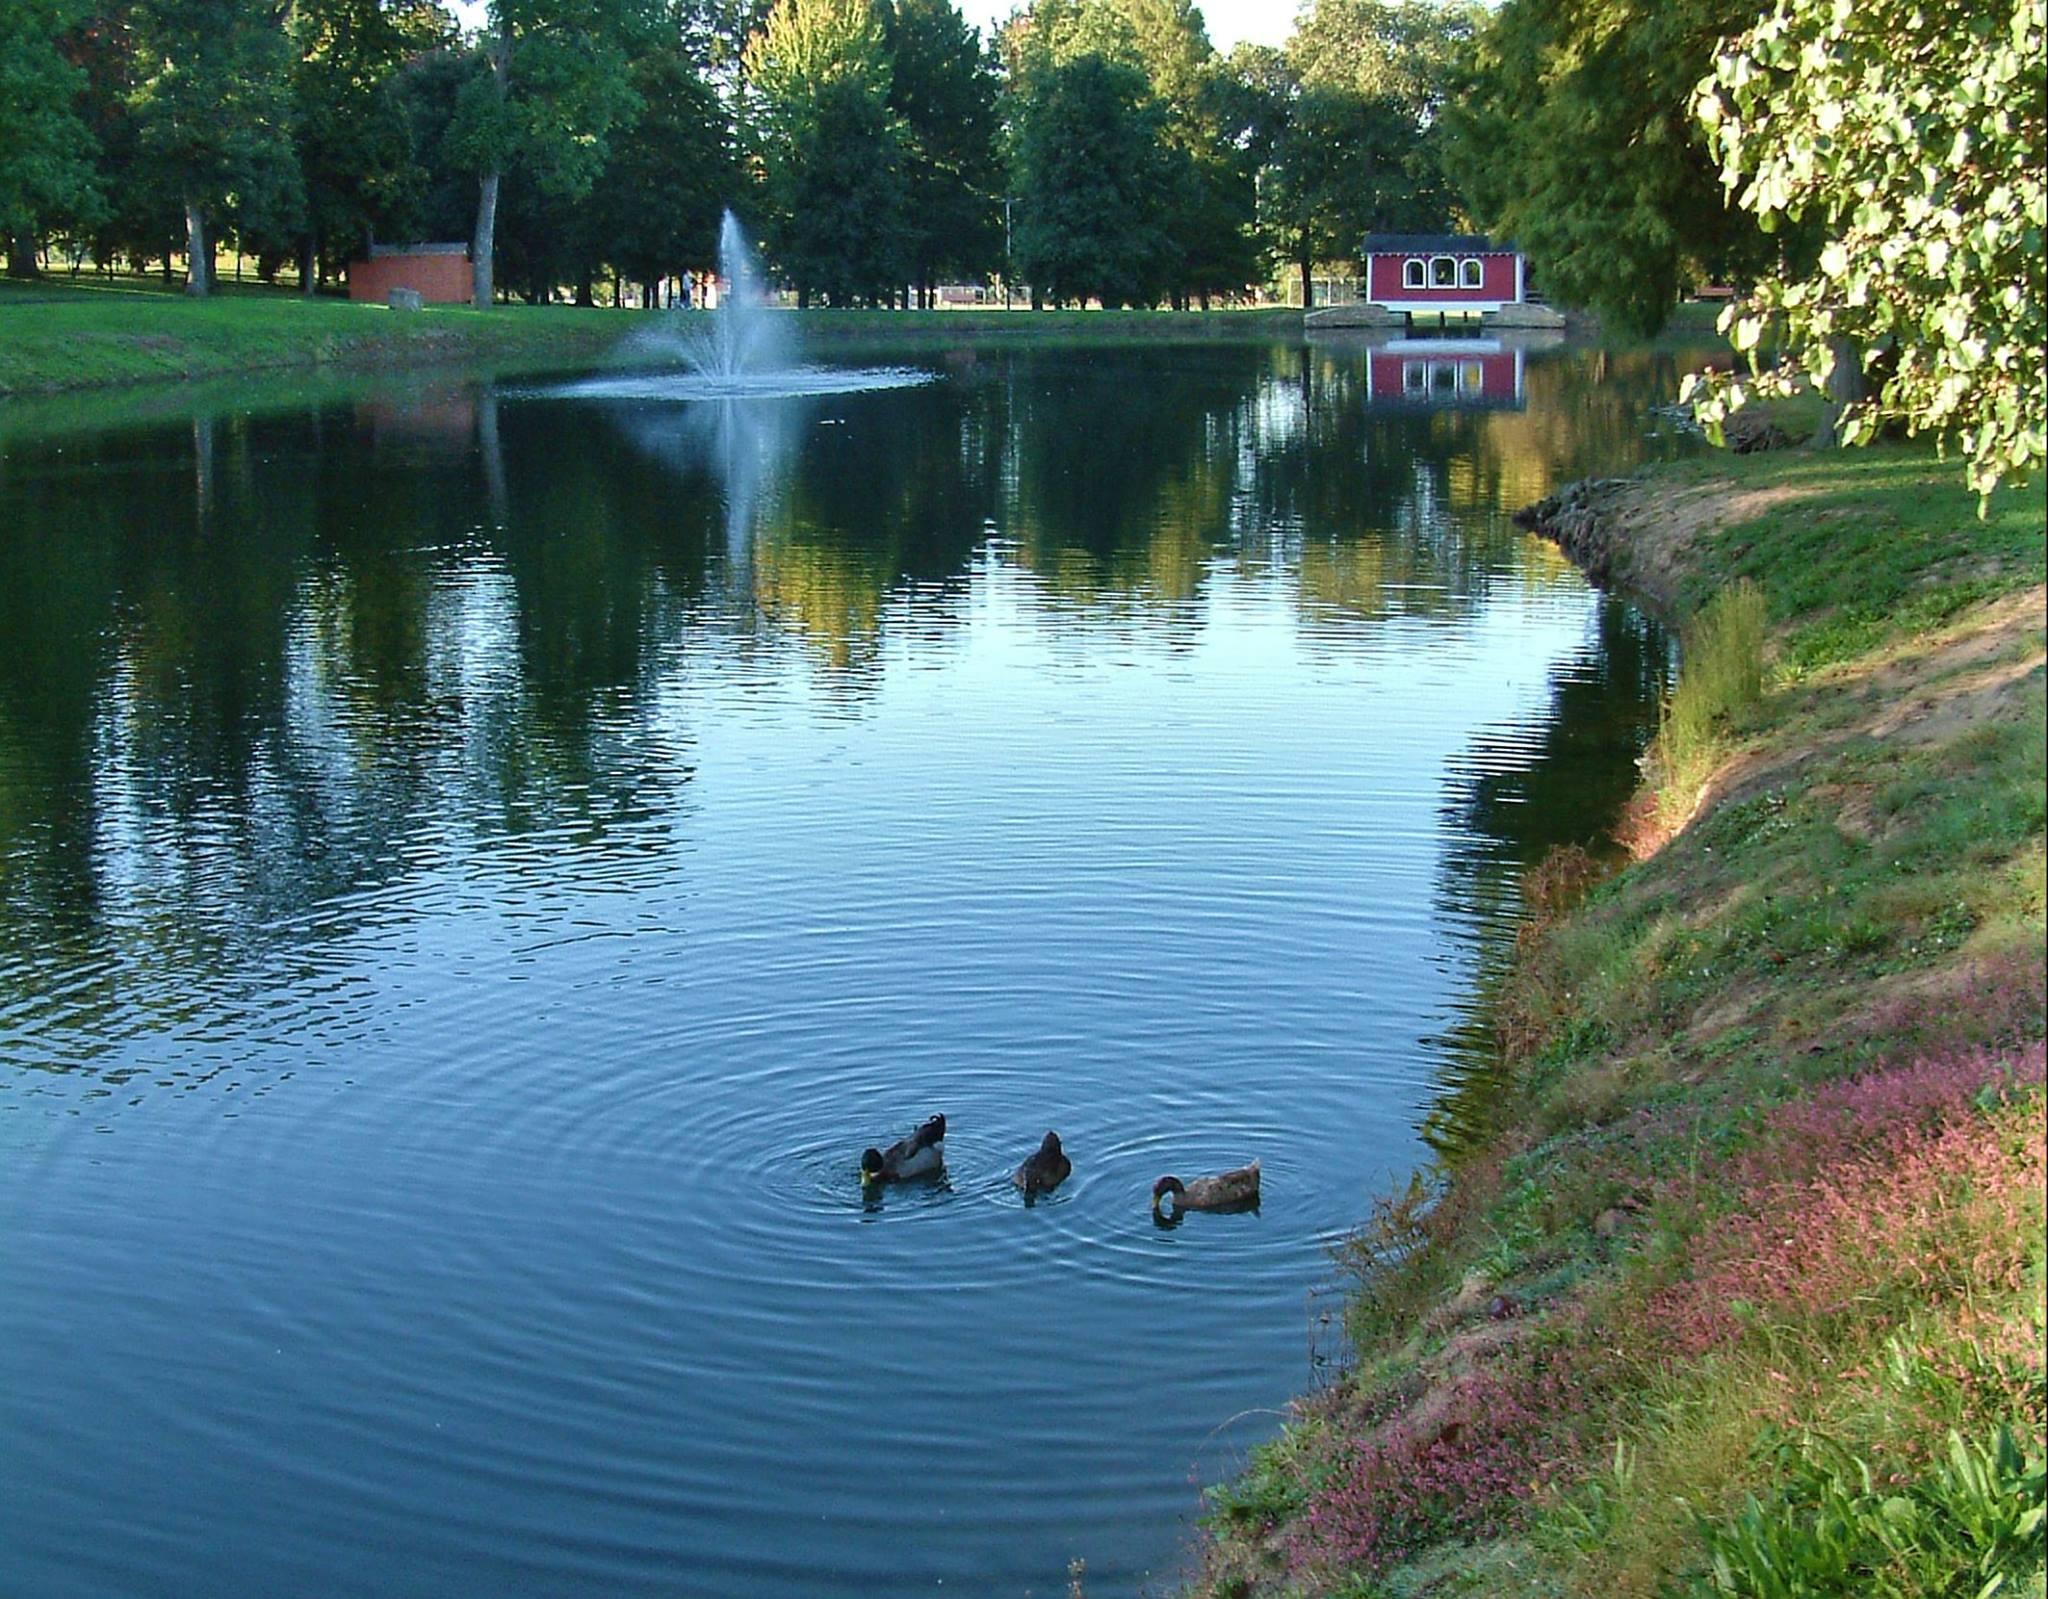 Ducks enjoying the lake at Leo French Park